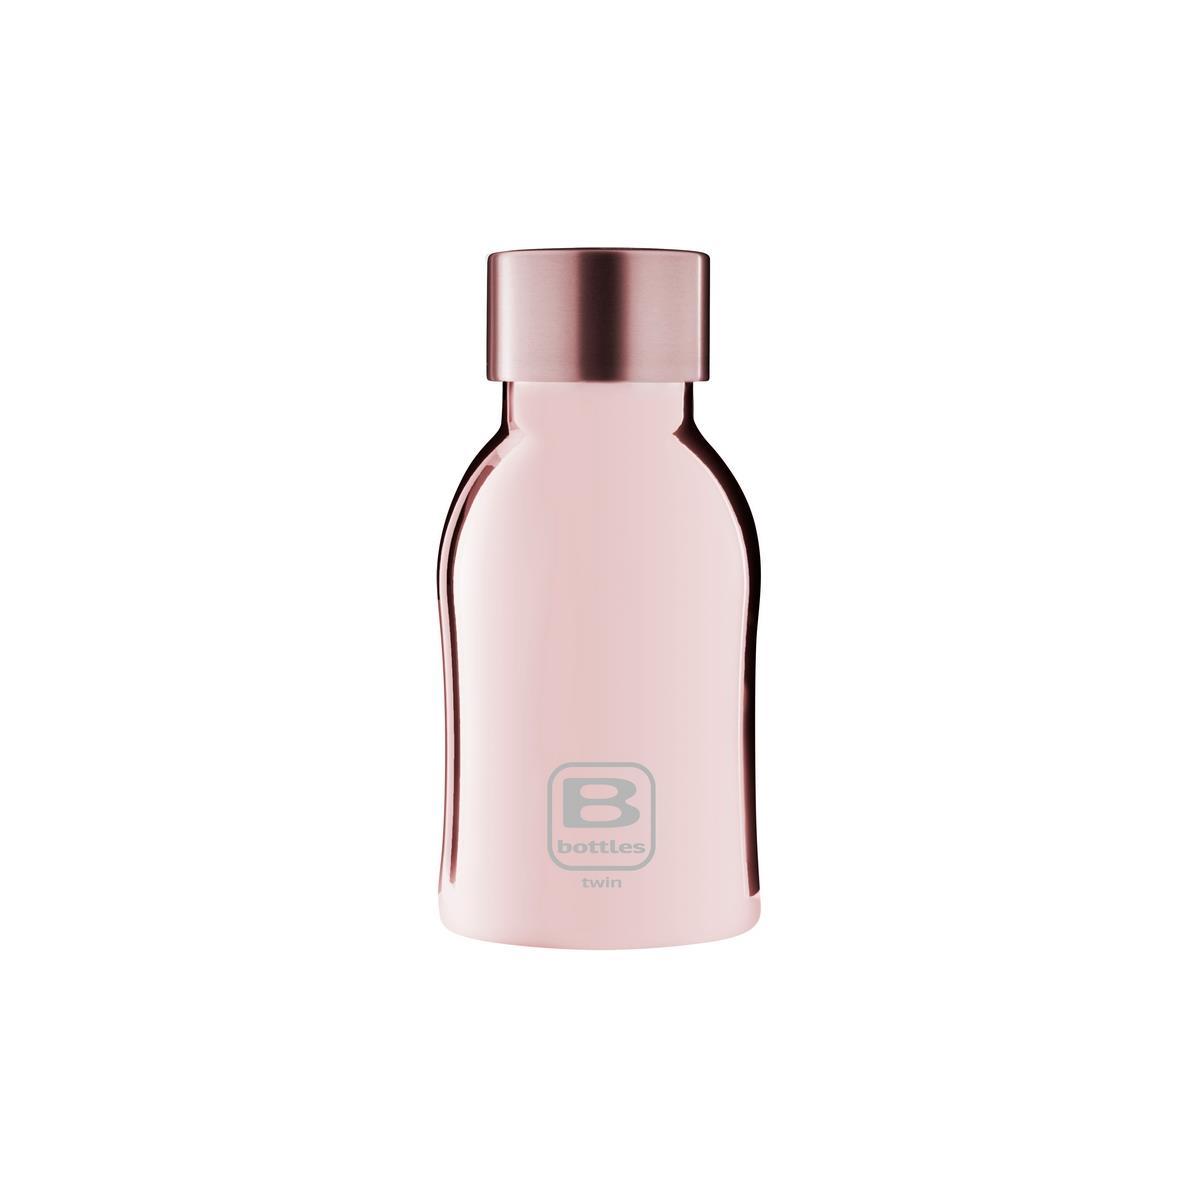 B Bottles Twin - Rose Gold Lux - 250 ml - Bottiglia Termica a doppia parete in acciaio inox 18/10